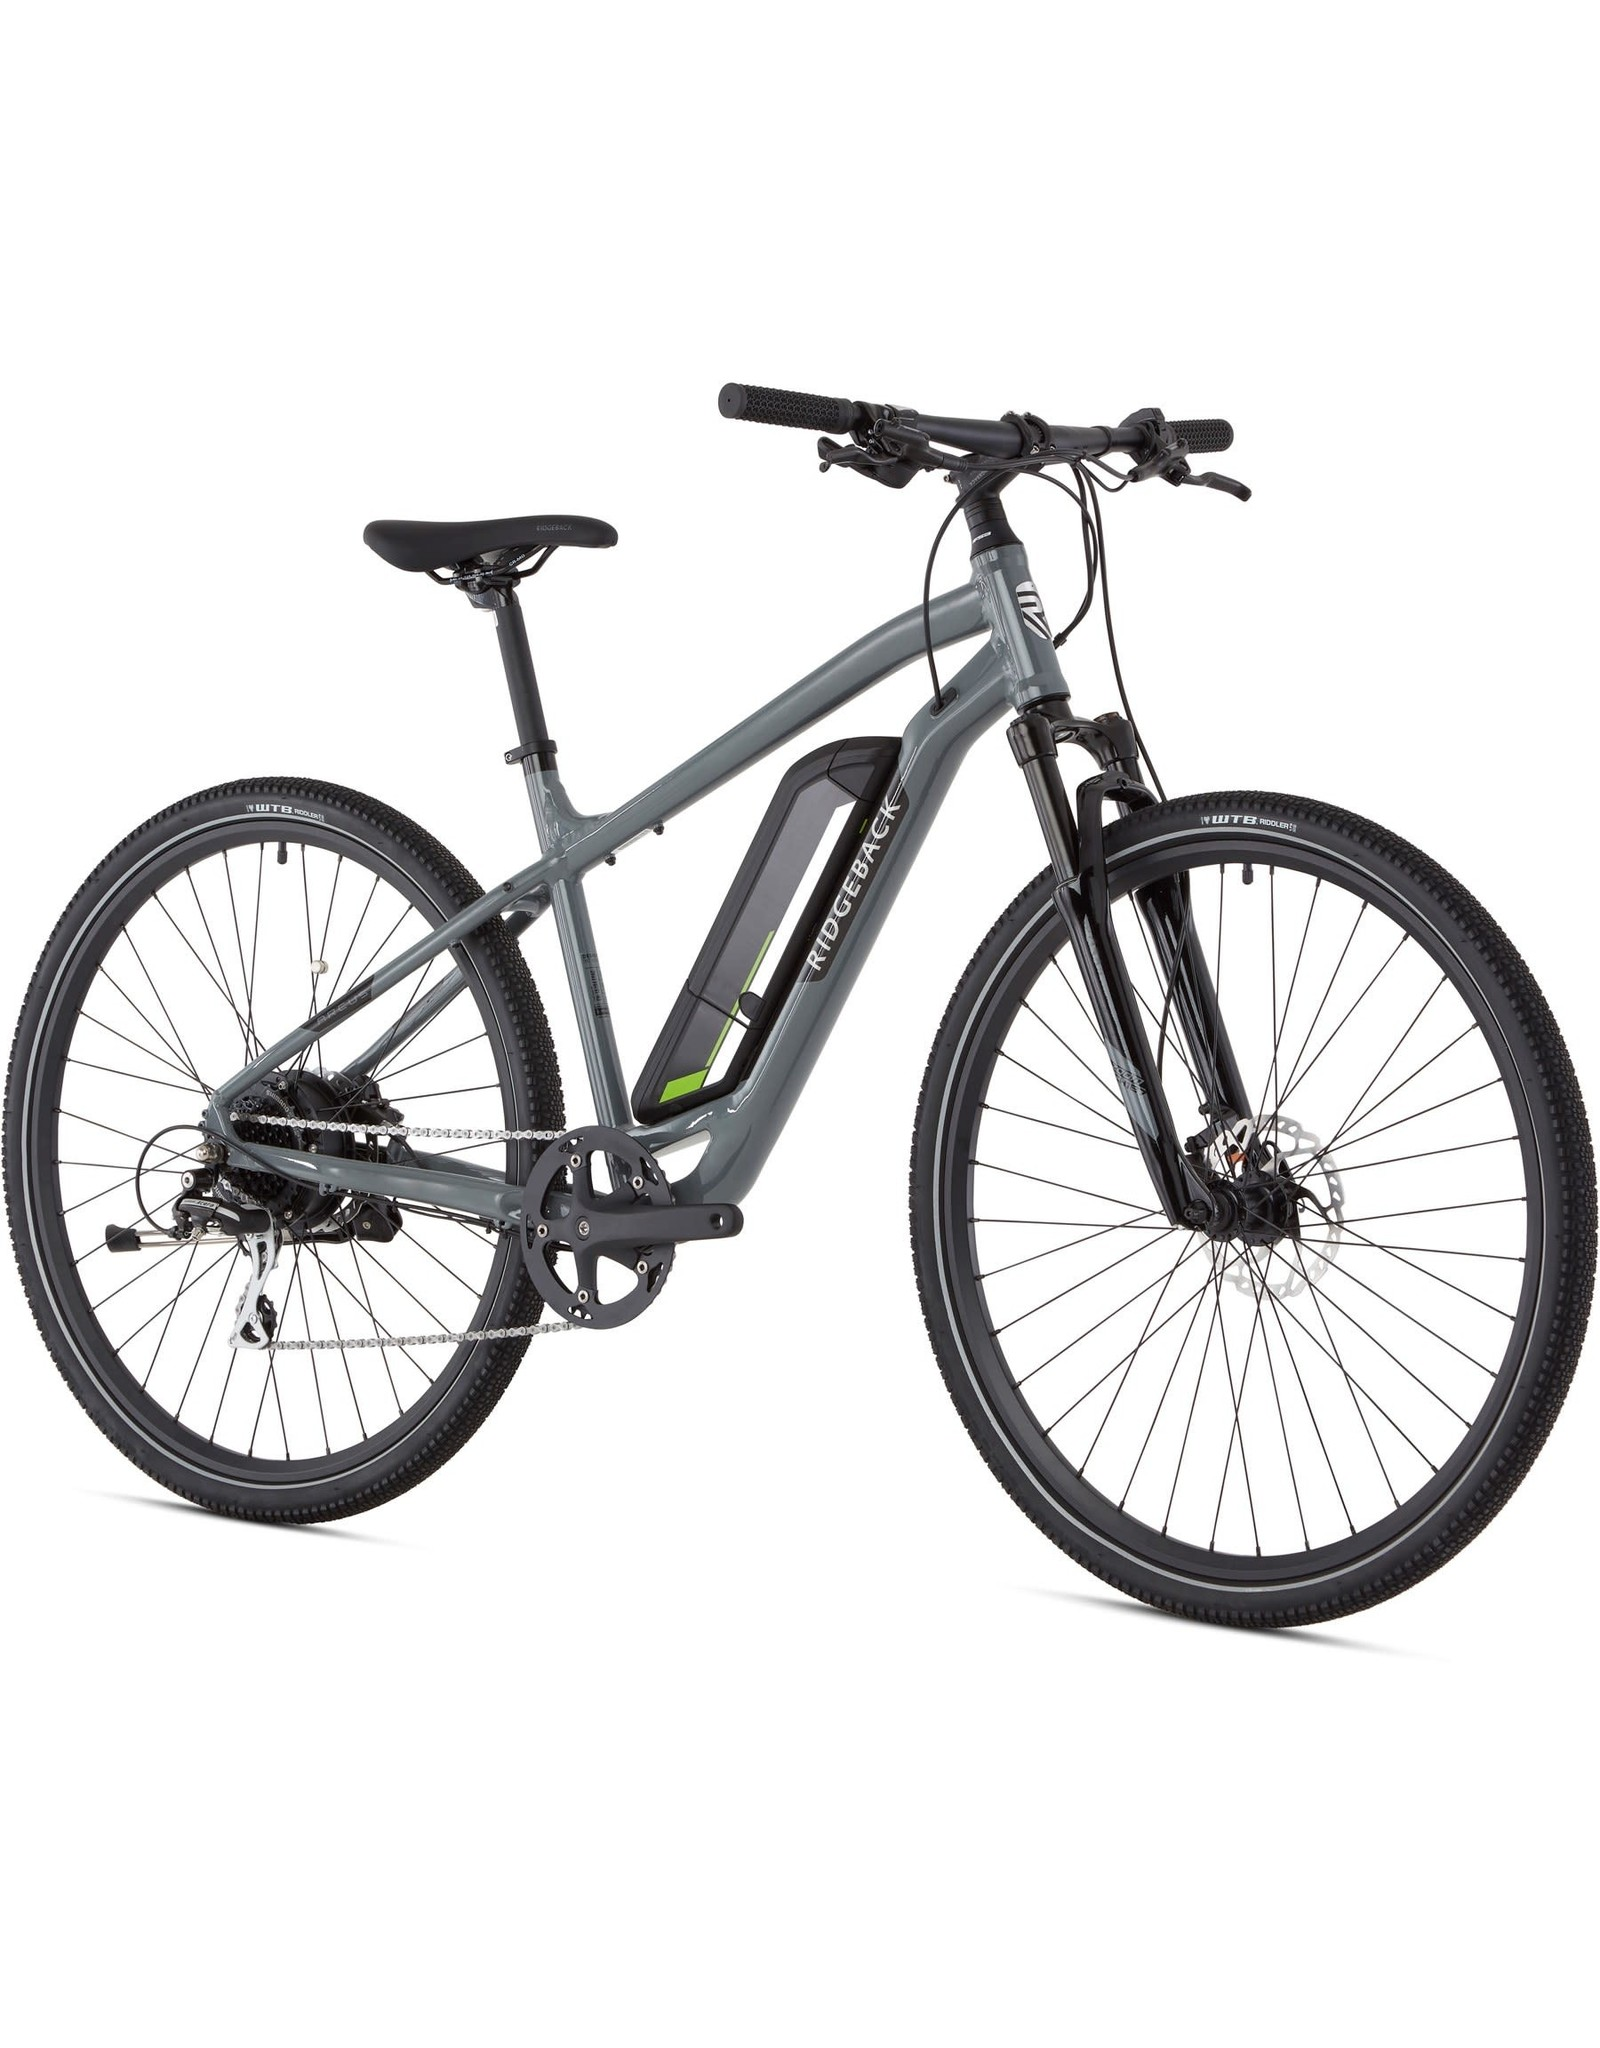 Ridgeback Arcus 1 MD Grey 2021